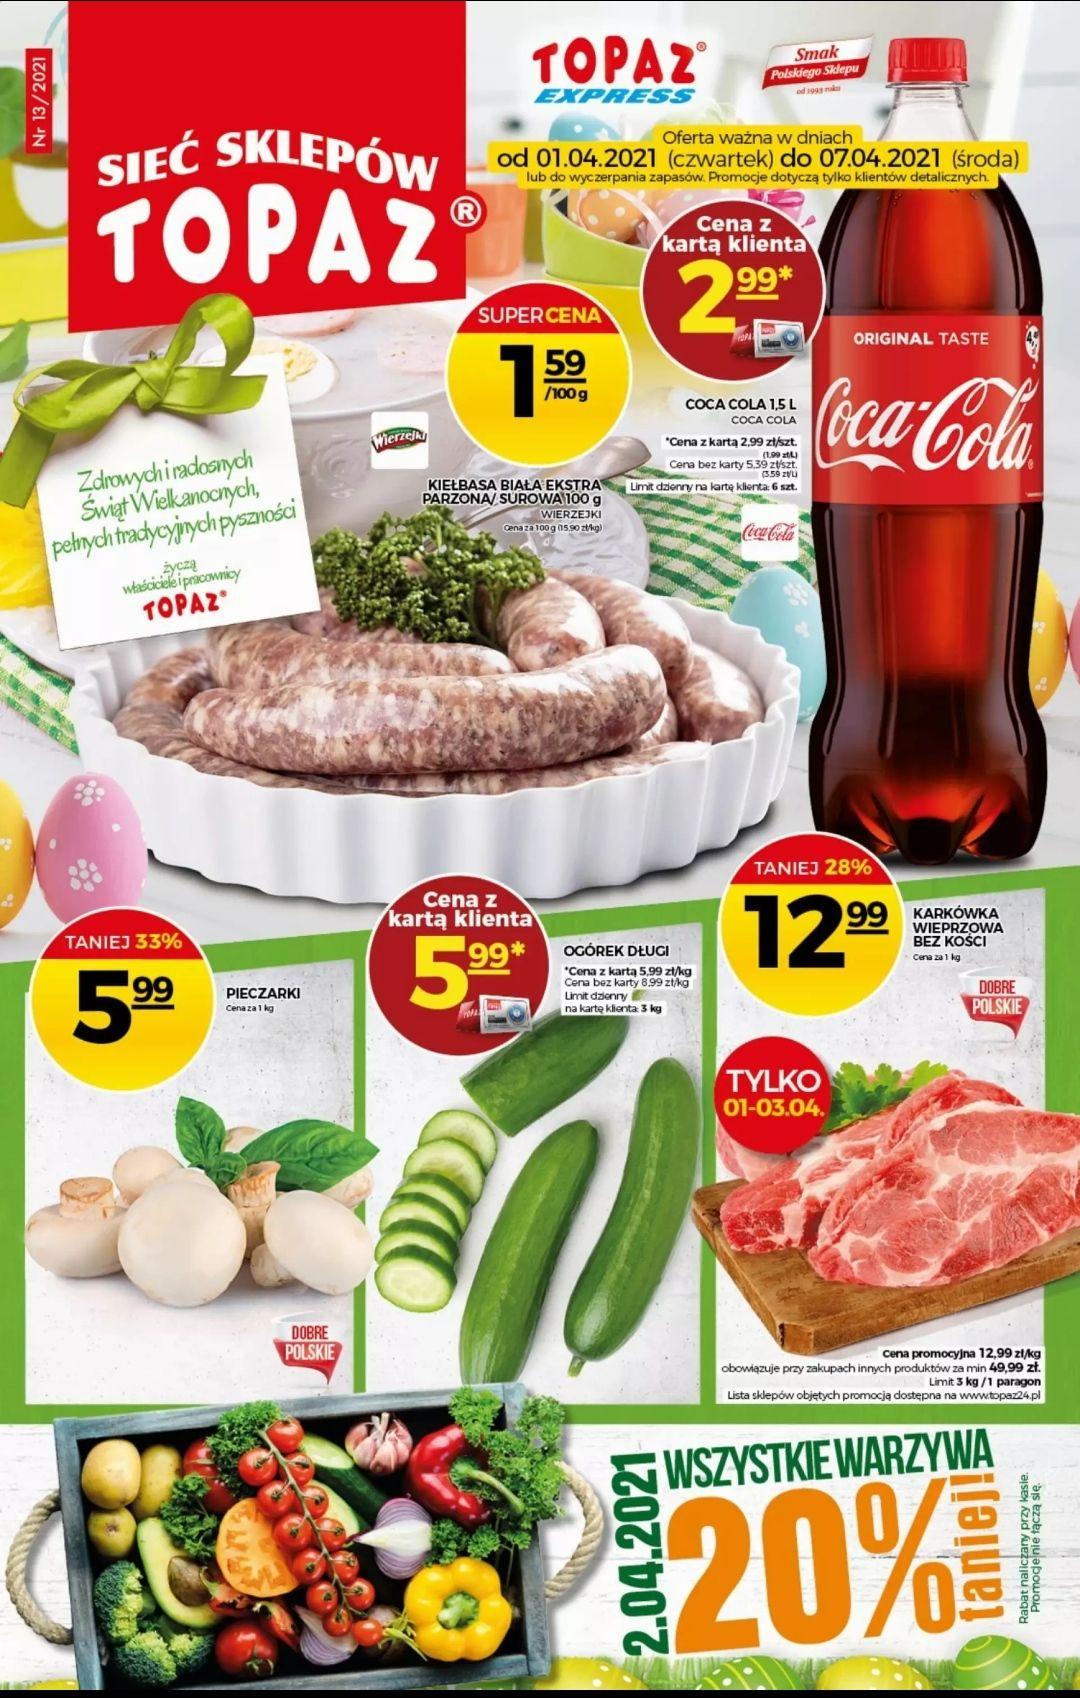 Coca-Cola 1,5l za 2,99 zł w TOPAZ